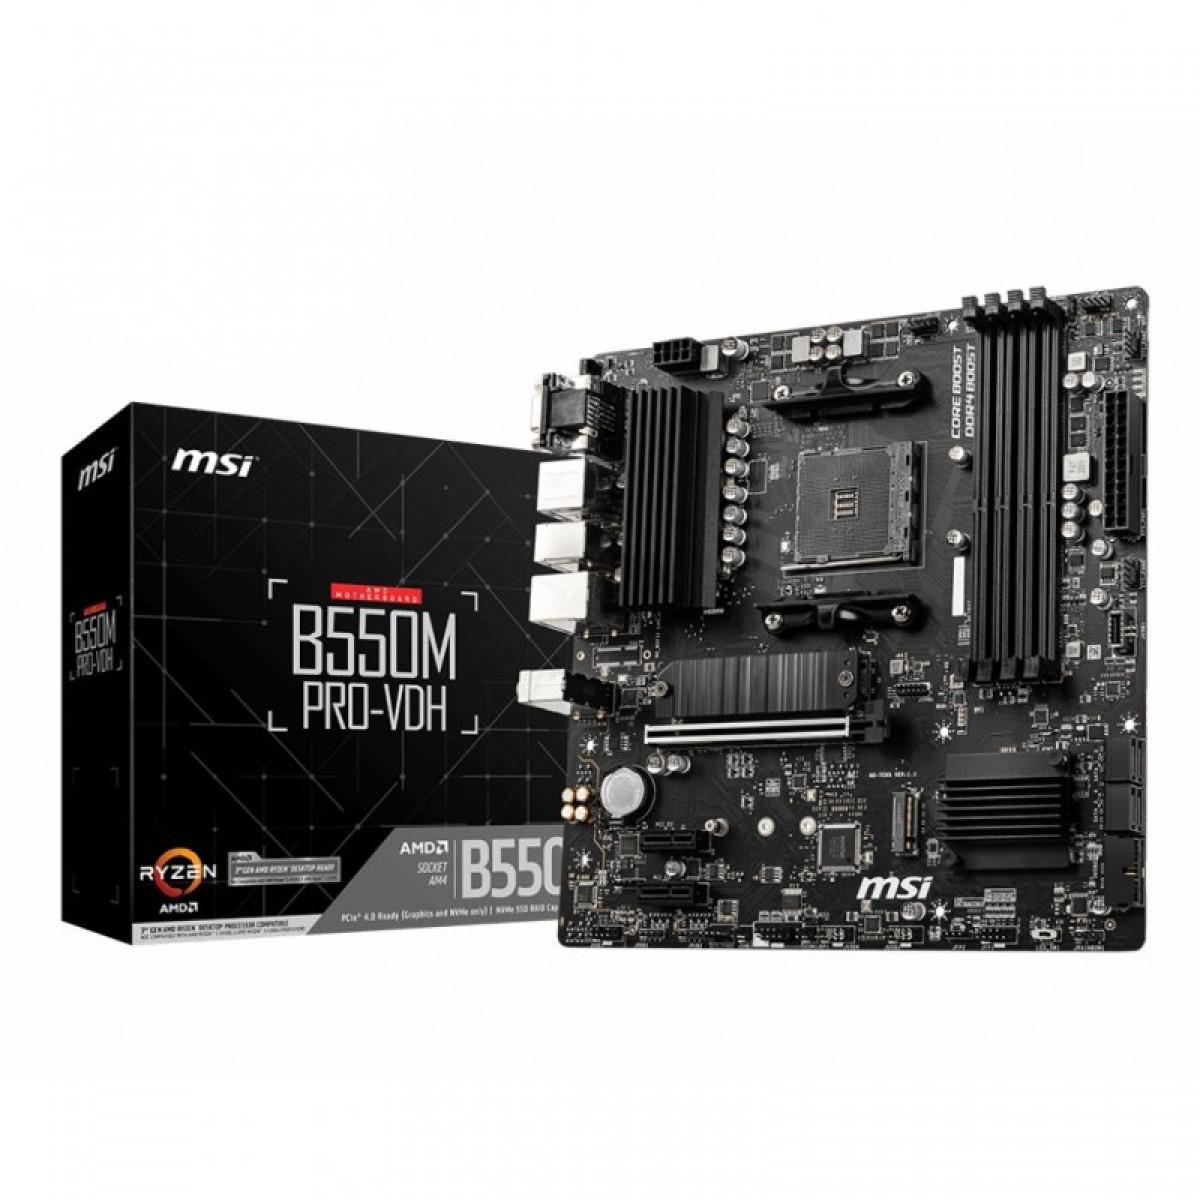 Placa Mãe MSI B550M PRO-VDH, Chipset B550, AMD AM4, mATX, DDR4